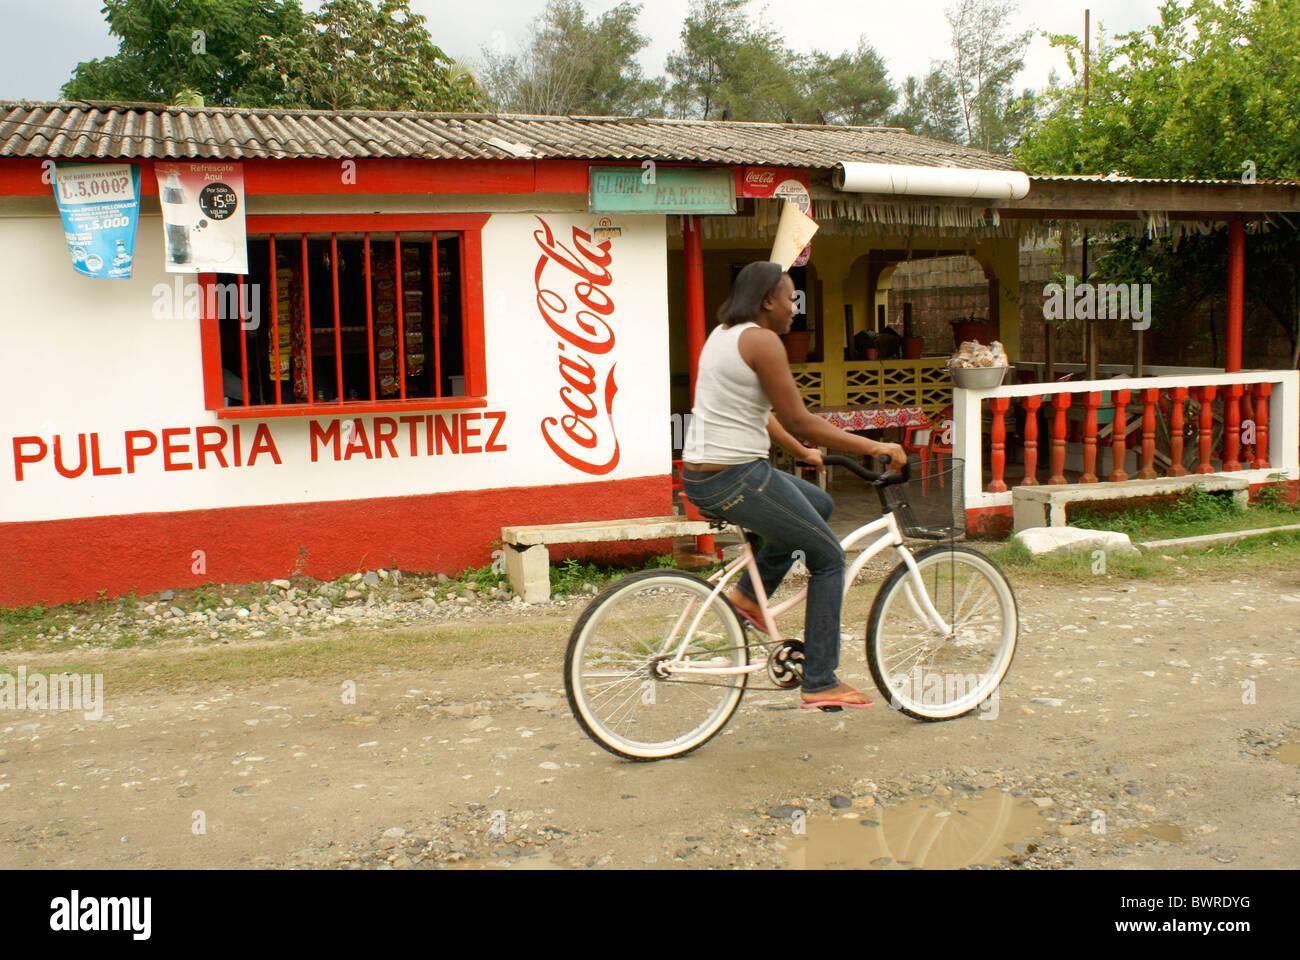 garifuna-woman-riding-a-bicycle-in-the-garifuna-village-of-triunfo-BWRDYG.jpg